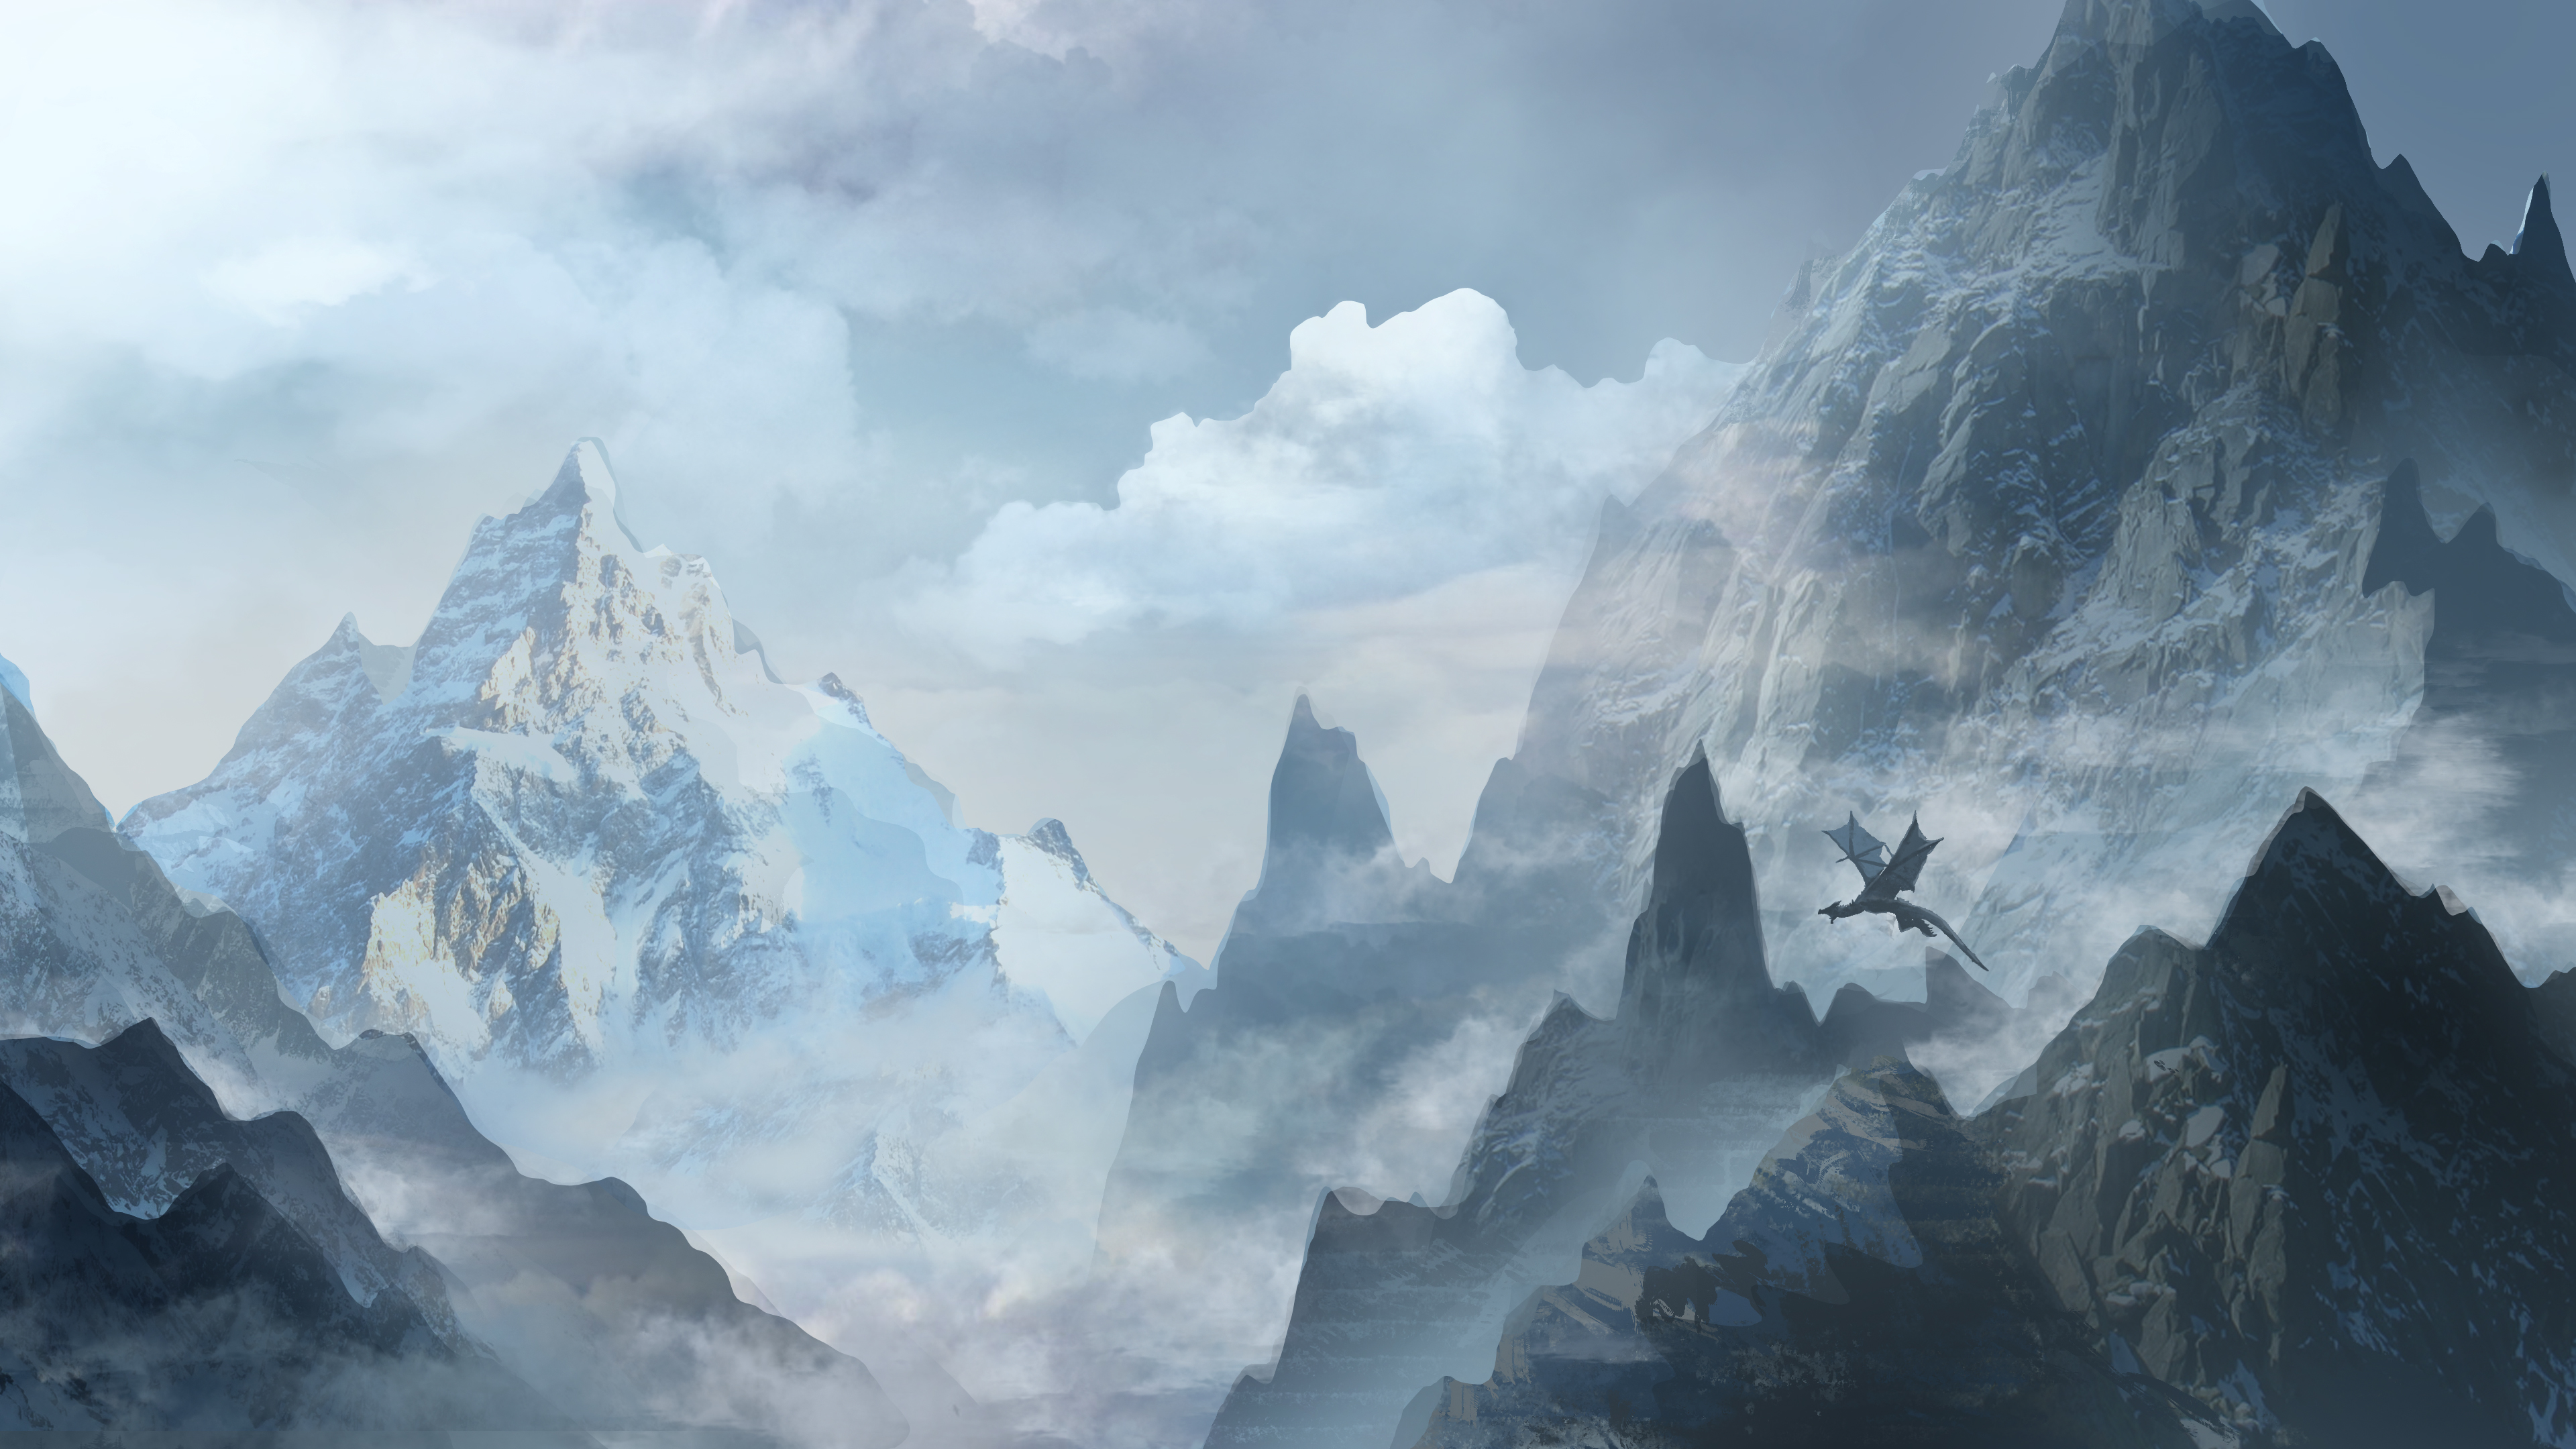 Skyrim by willroberts04